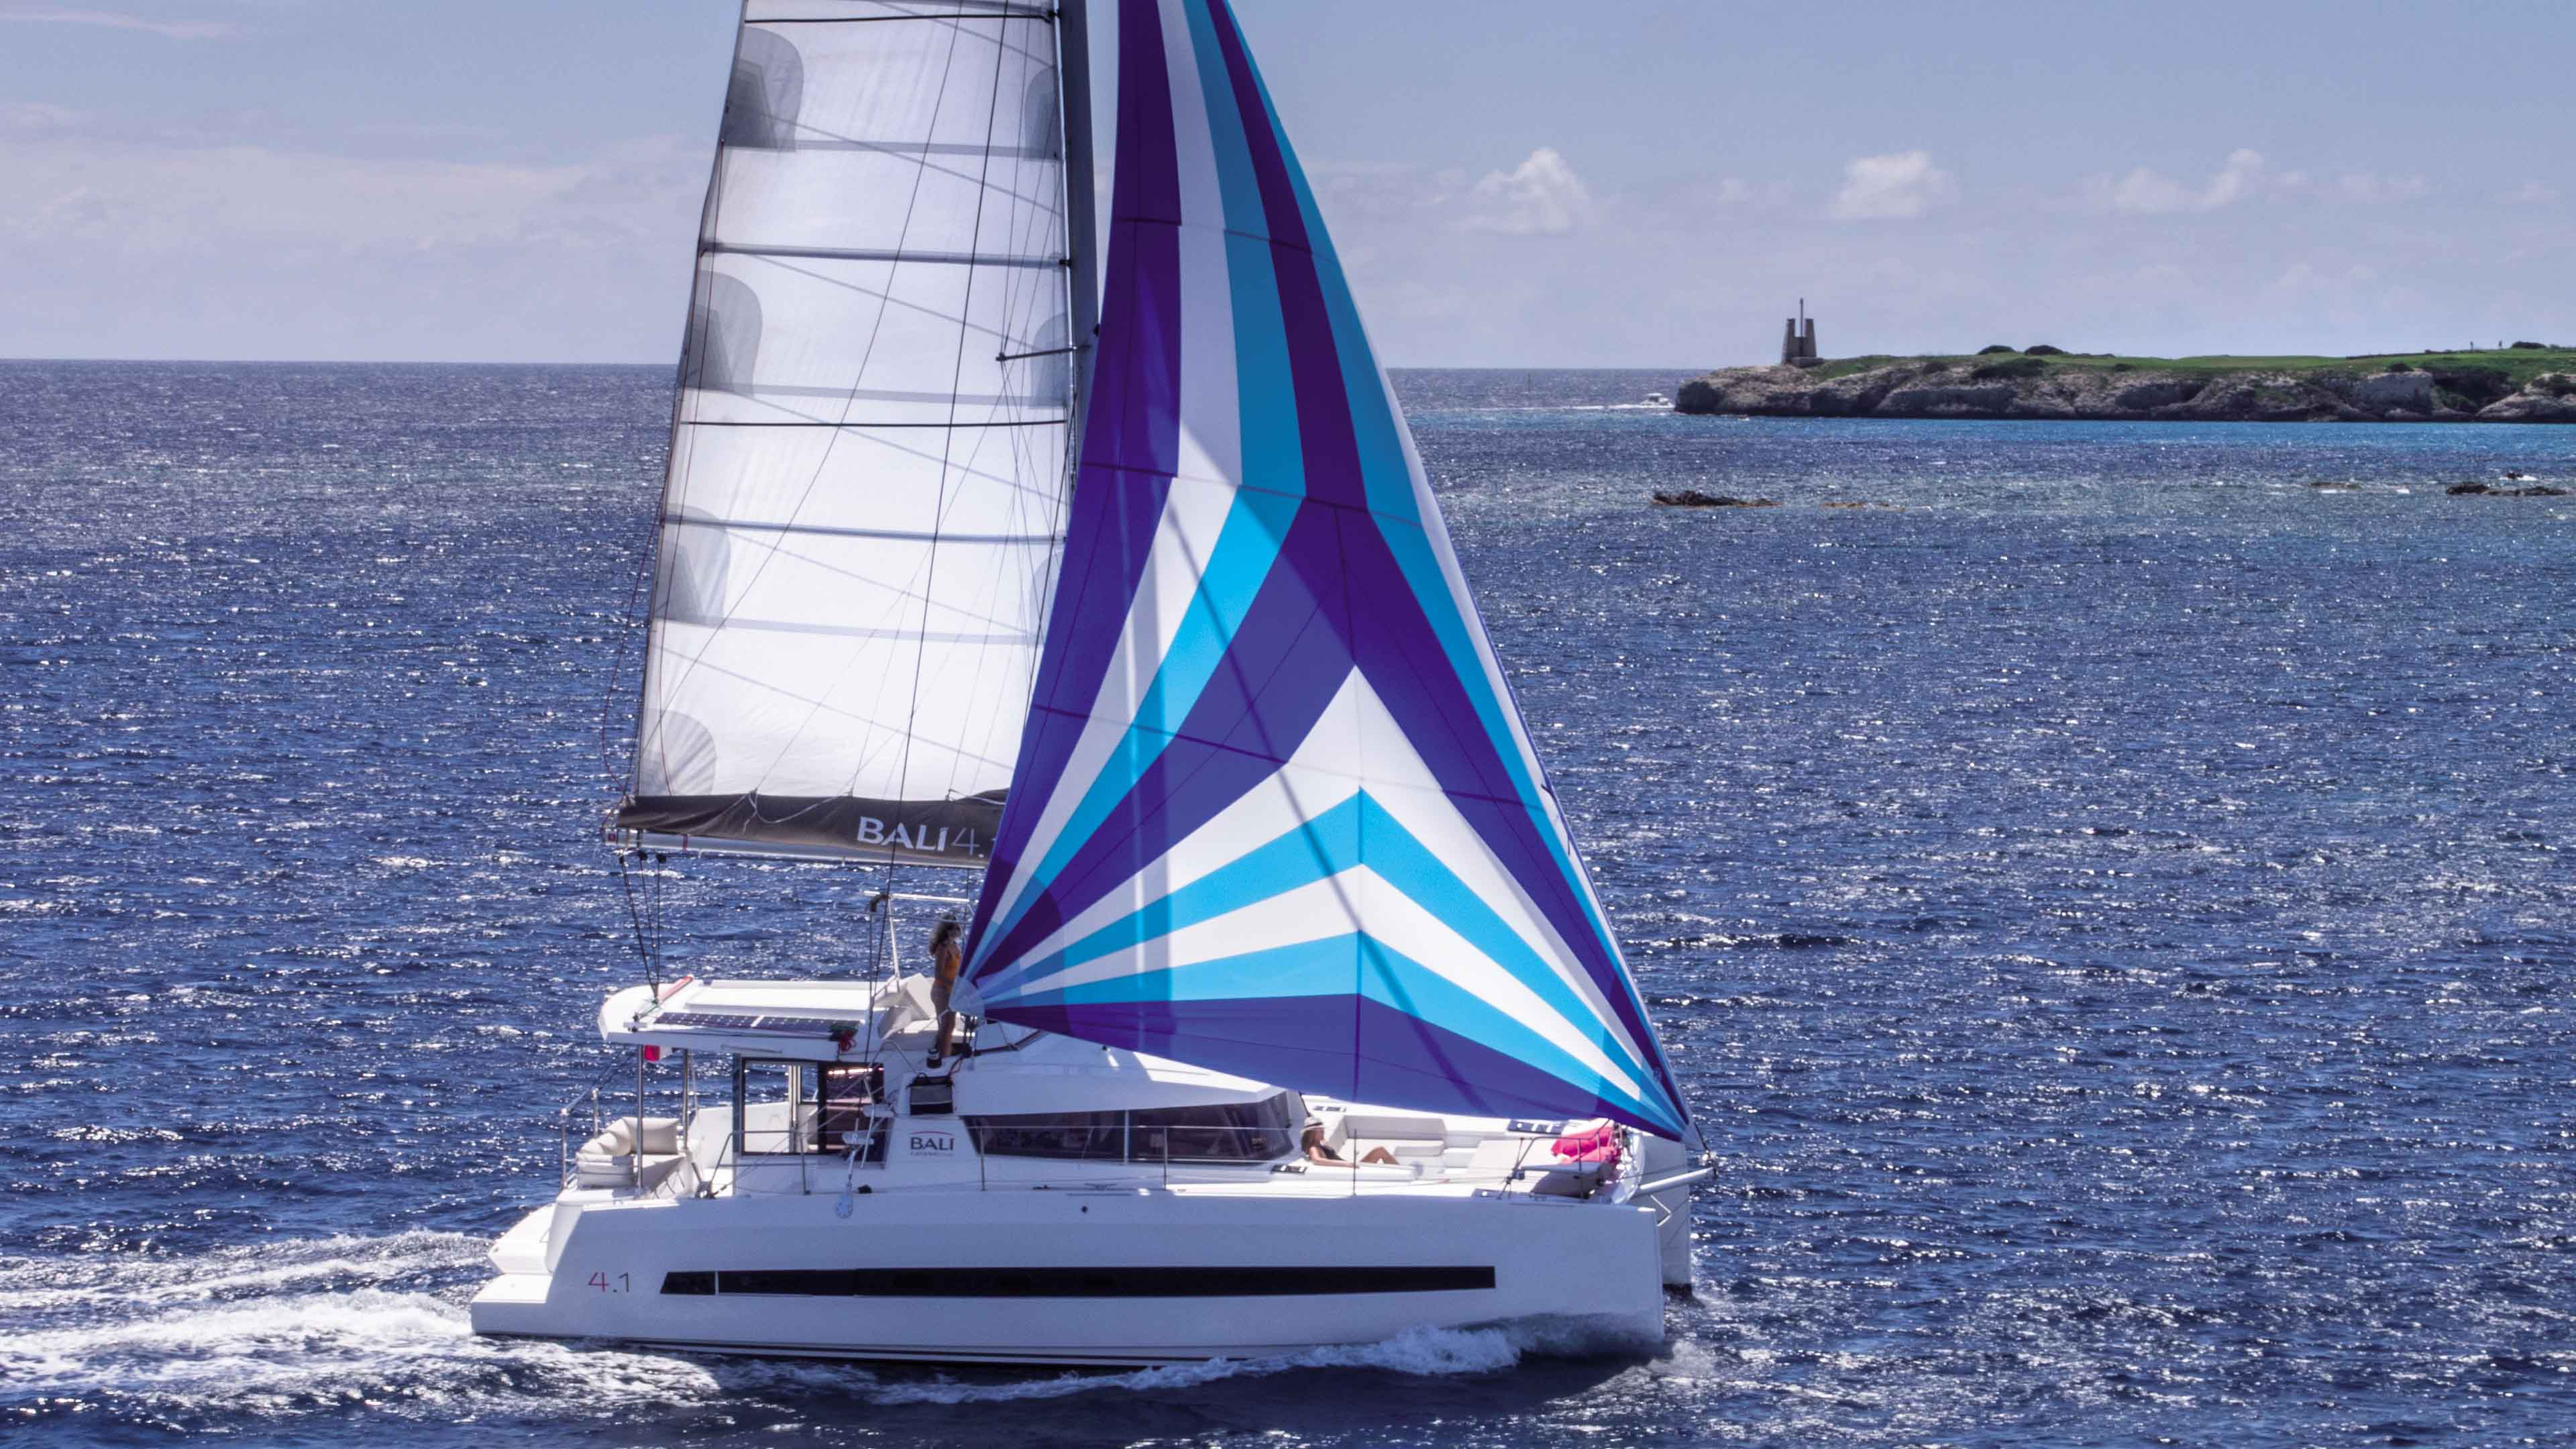 Bali 4.1 Prestige - Catamaran- Bali 4.1 (4Cab)